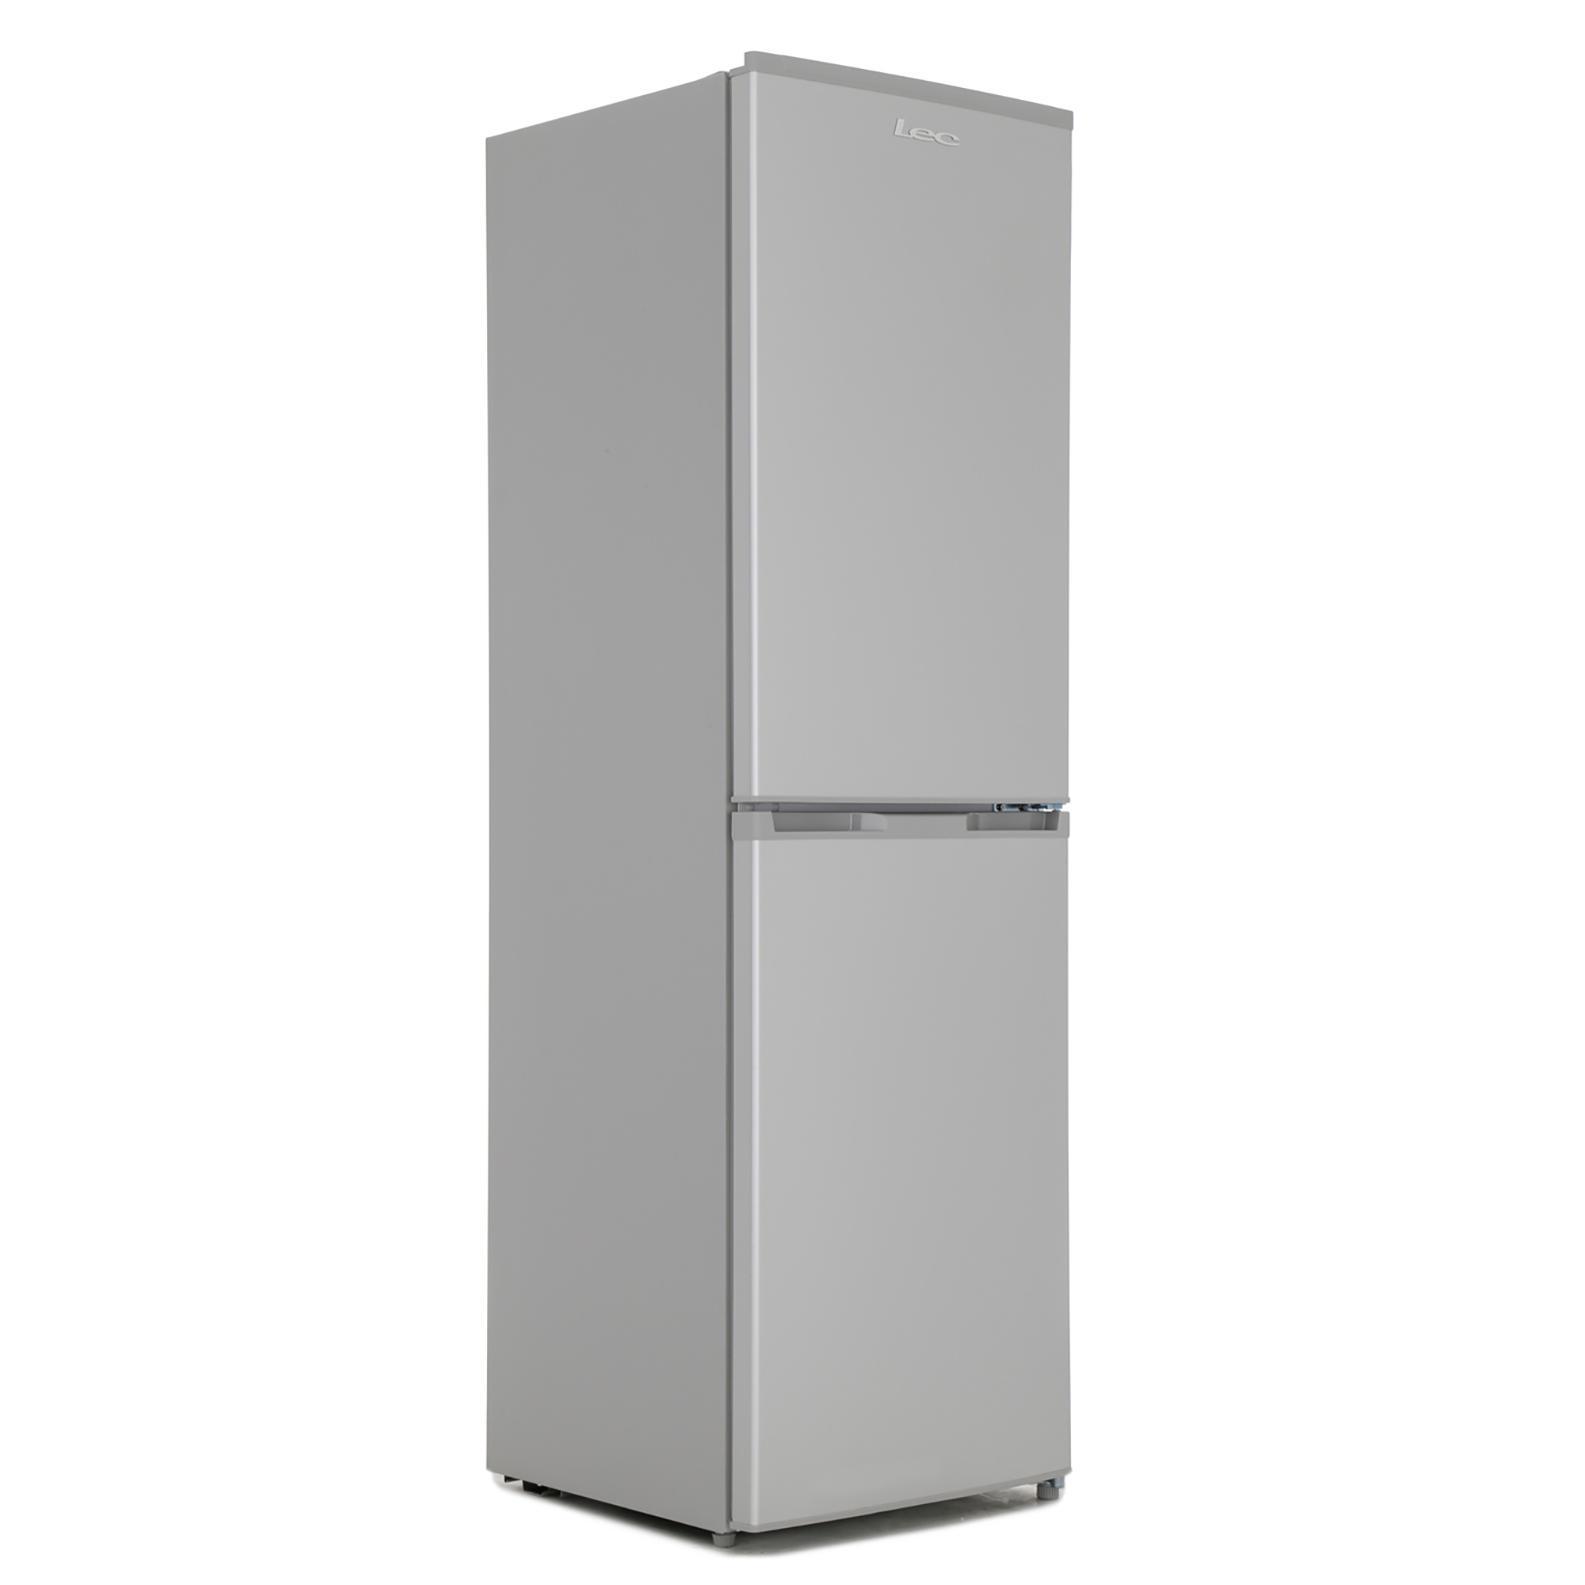 Lec TF55185S Silver Frost Free Fridge Freezer